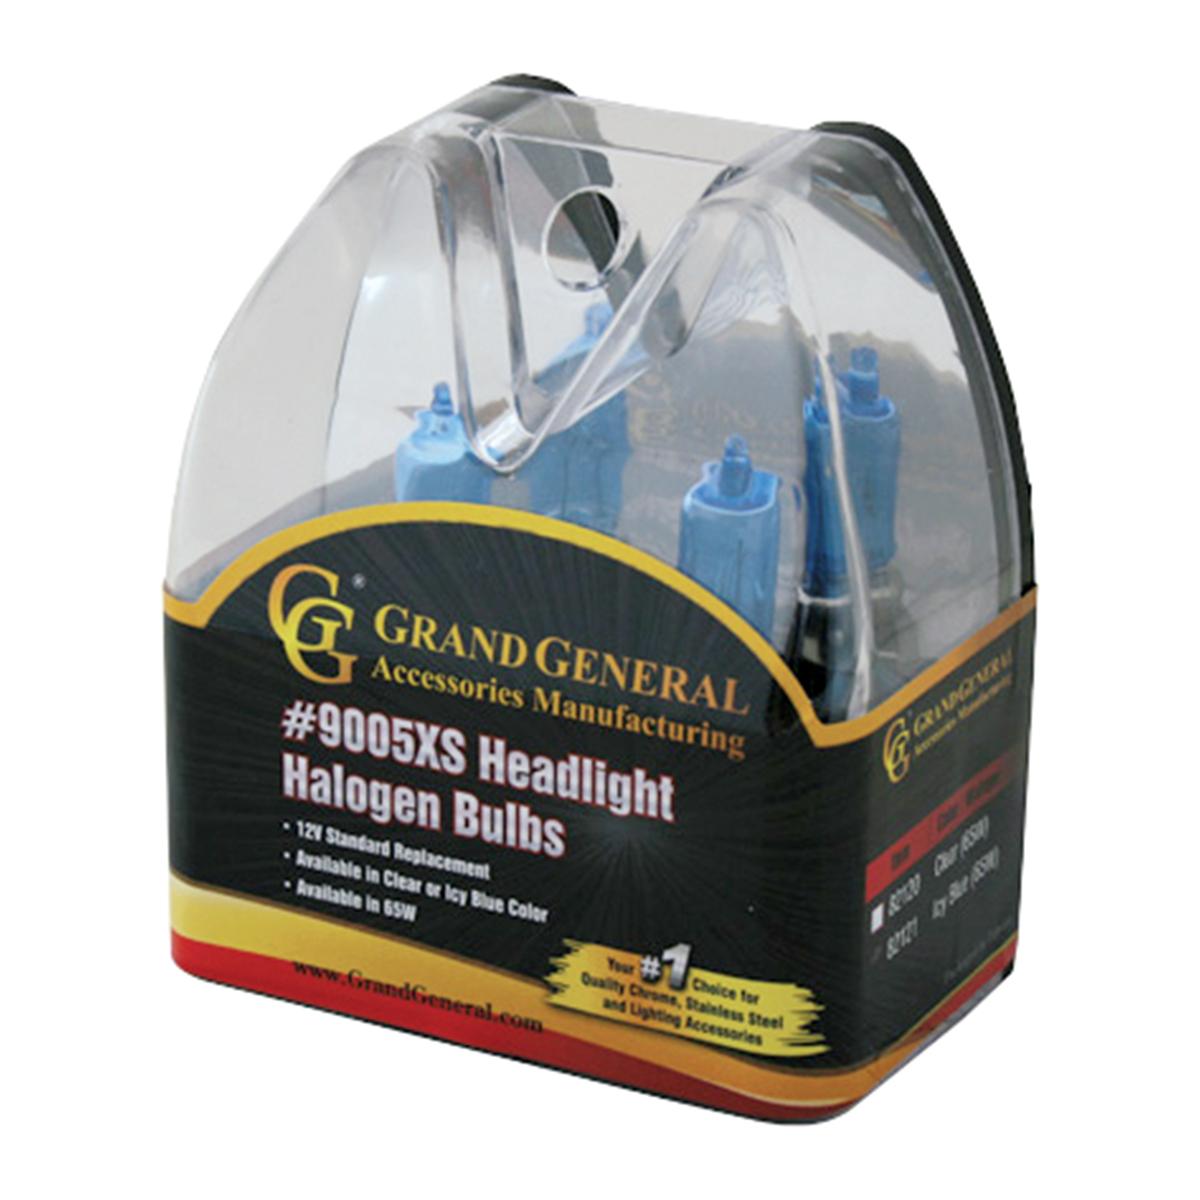 82123 9005XS Headlight Halogen Bulb